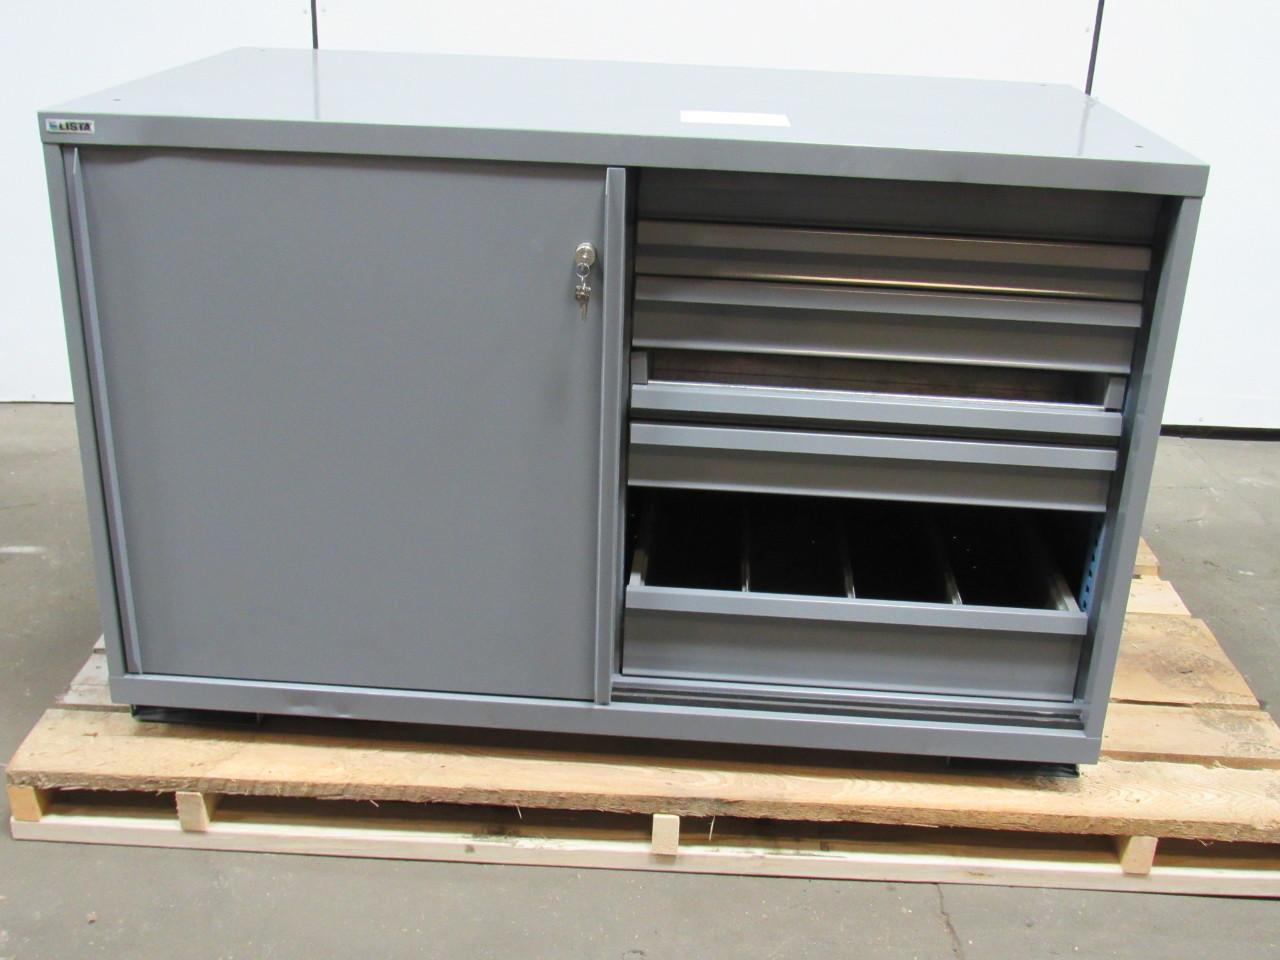 lista double wide 13 drawer industrial tool part storage. Black Bedroom Furniture Sets. Home Design Ideas